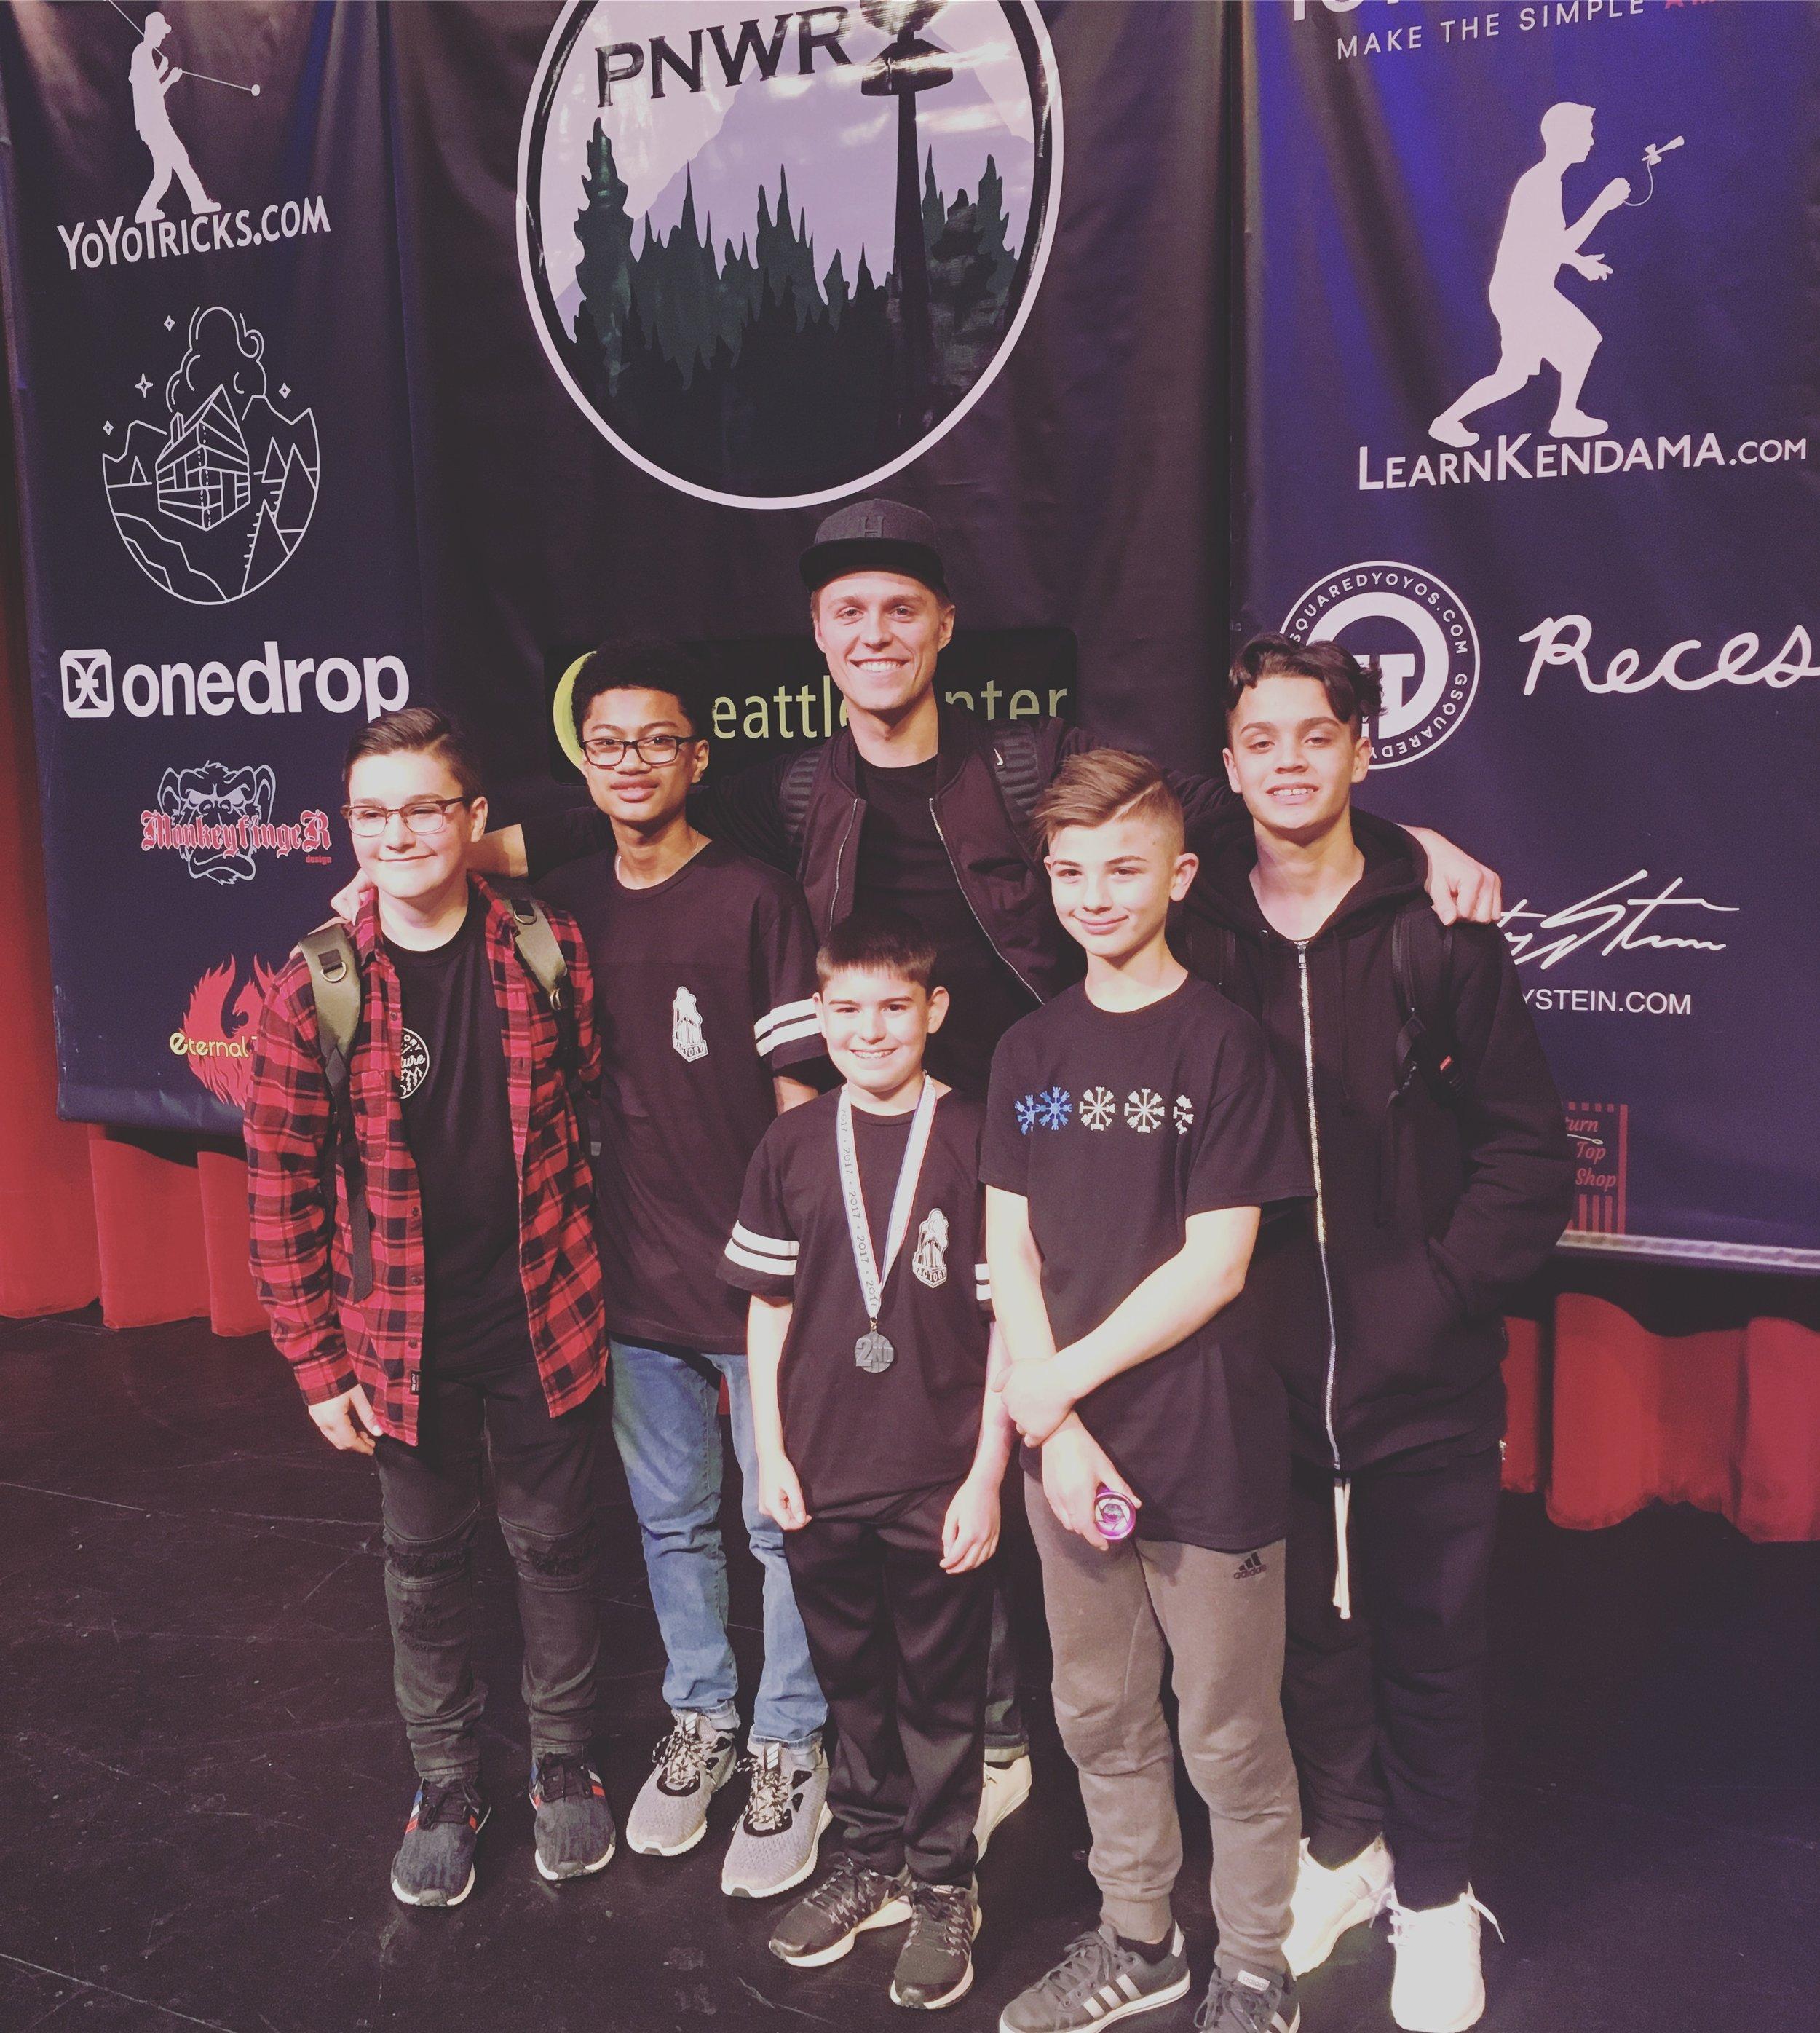 Left to right: Ryan Cvijanlvich, Angelo Aguirre, Hunter Feuerstein, Josiah Davis, Joey Montoya.